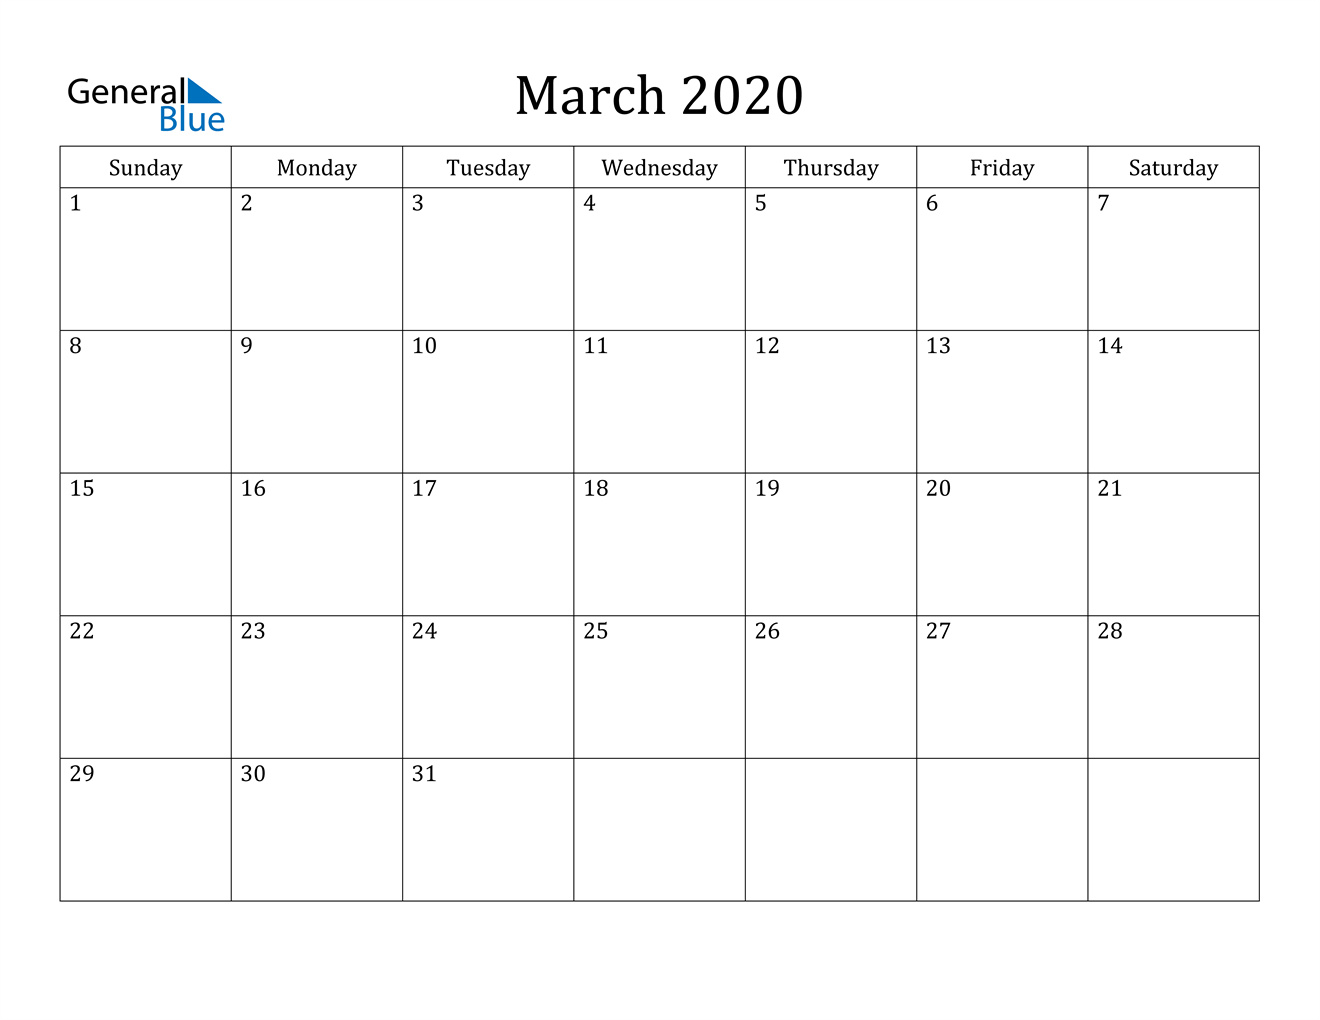 Image of March 2020 Classic Professional Calendar Calendar